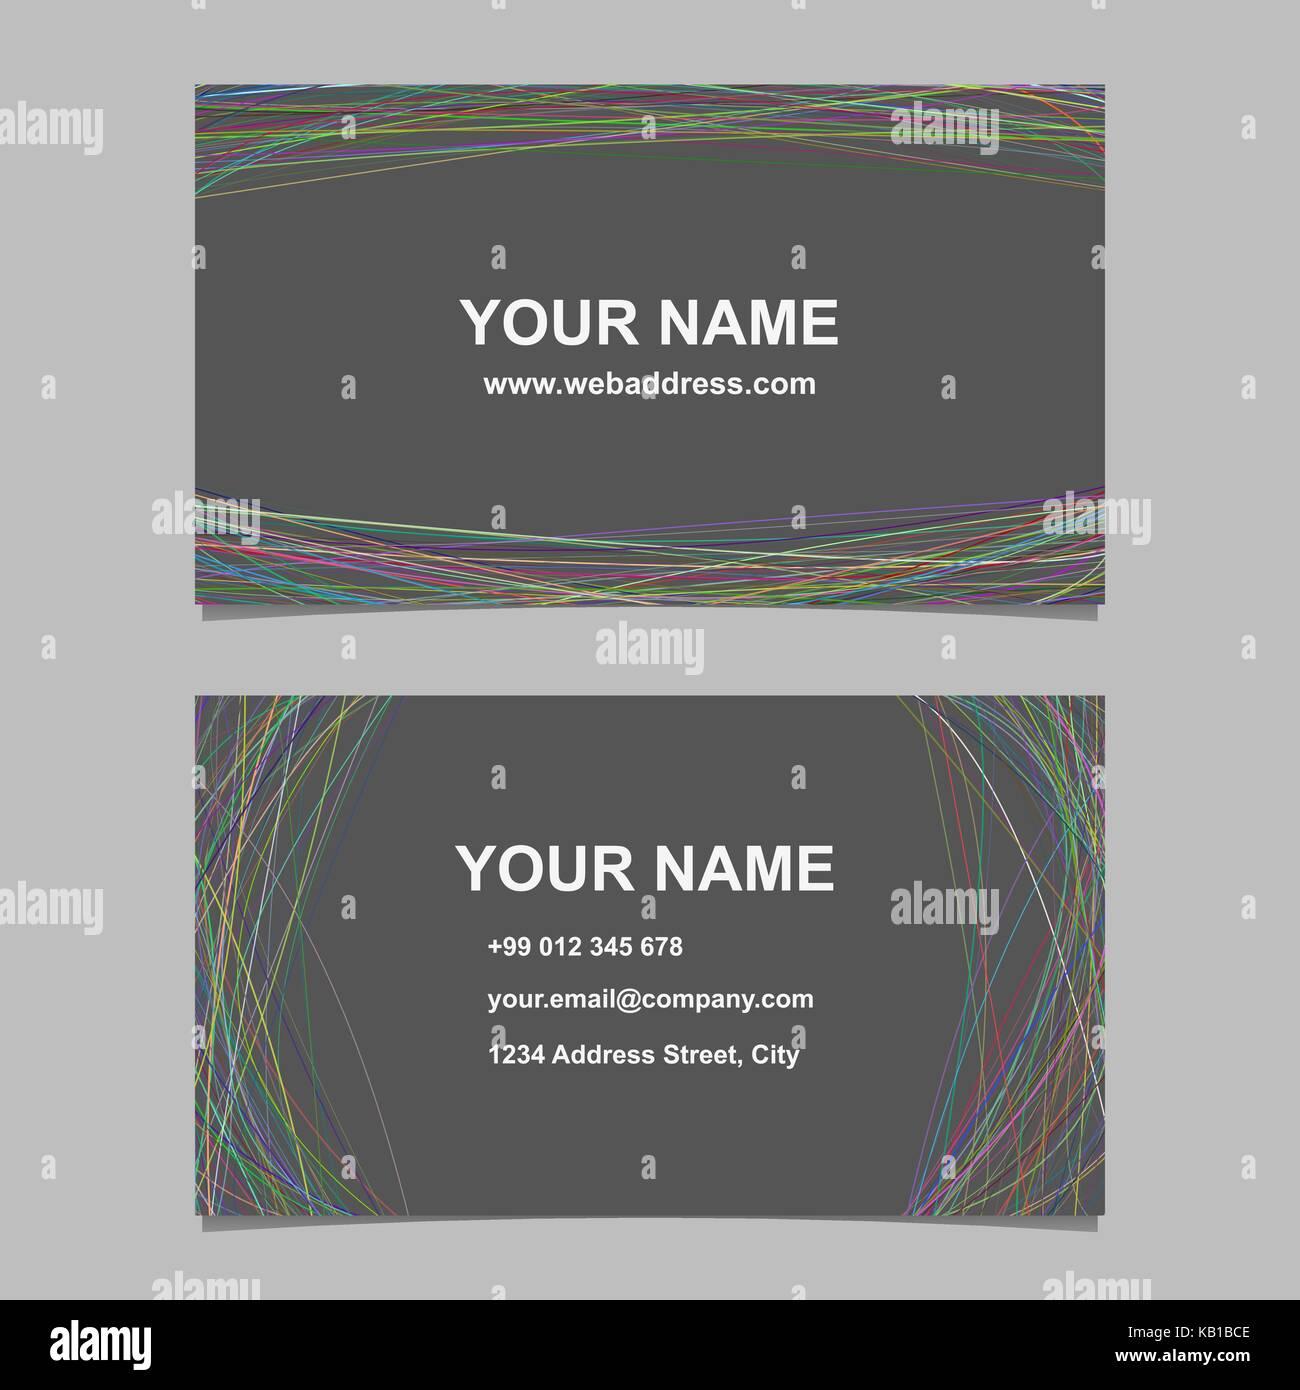 Modern business card template design set vector id card design modern business card template design set vector id card design with arched lines on grey background flashek Gallery